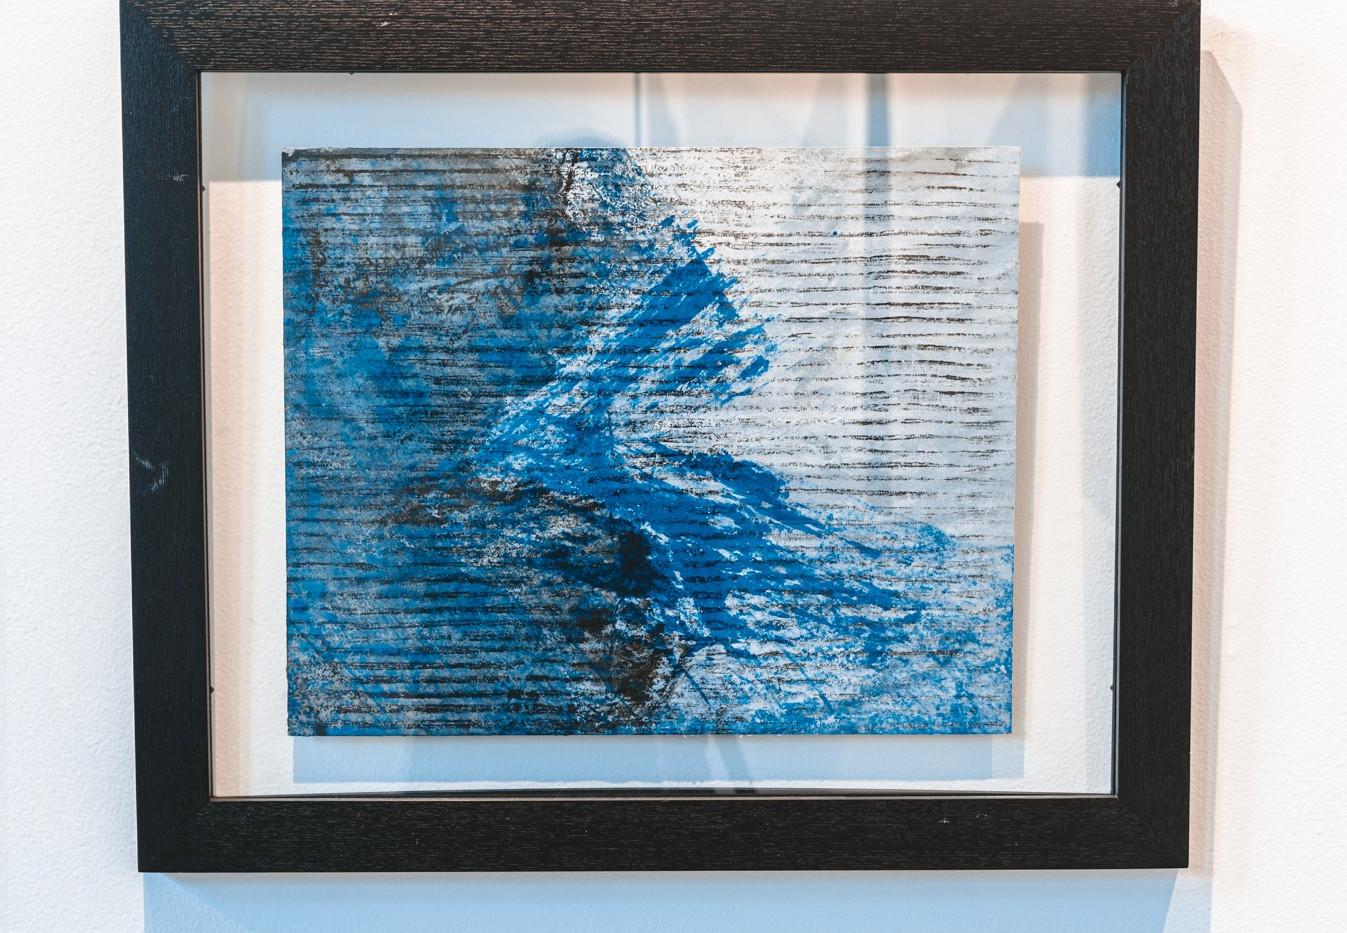 "IRA TATTELMAN  ""Vardar River Cascade""  Monoprint on Fabriano Tiepolo paper 18.75"" x 22.75"" framed 2019 $425  Photograph by StereoVision"